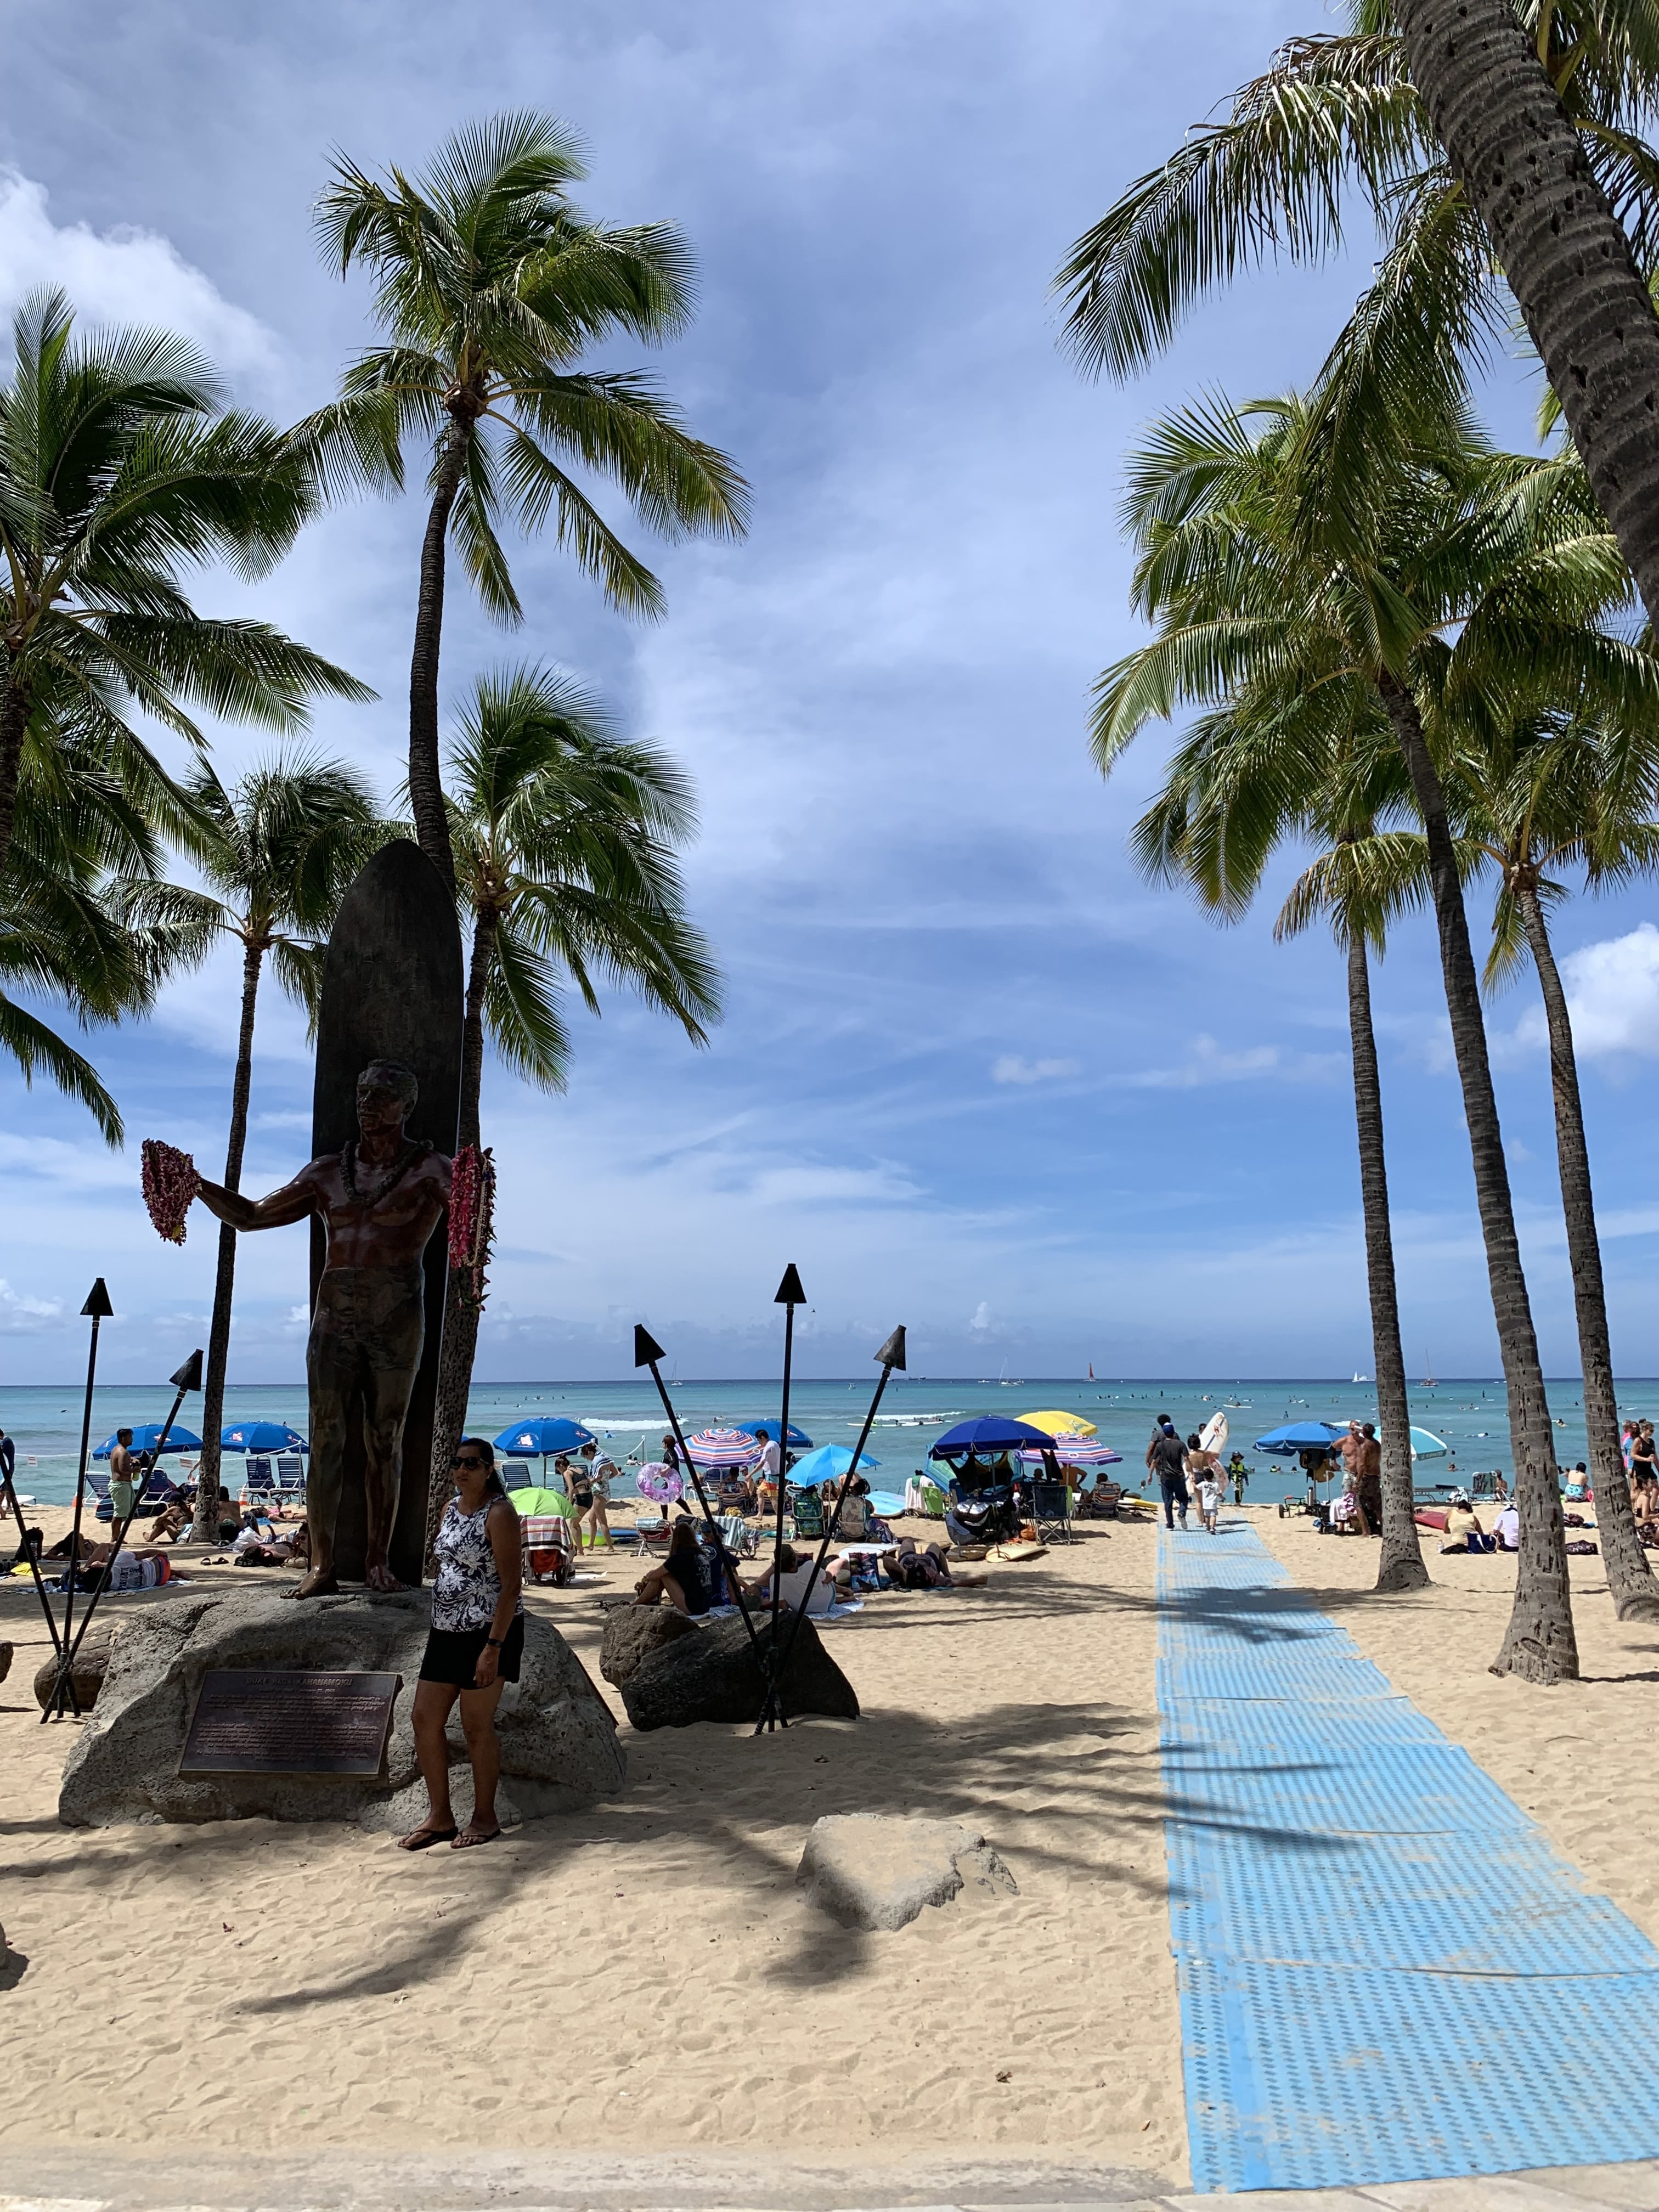 Duke Statue Honolulu - Waikiki Beach